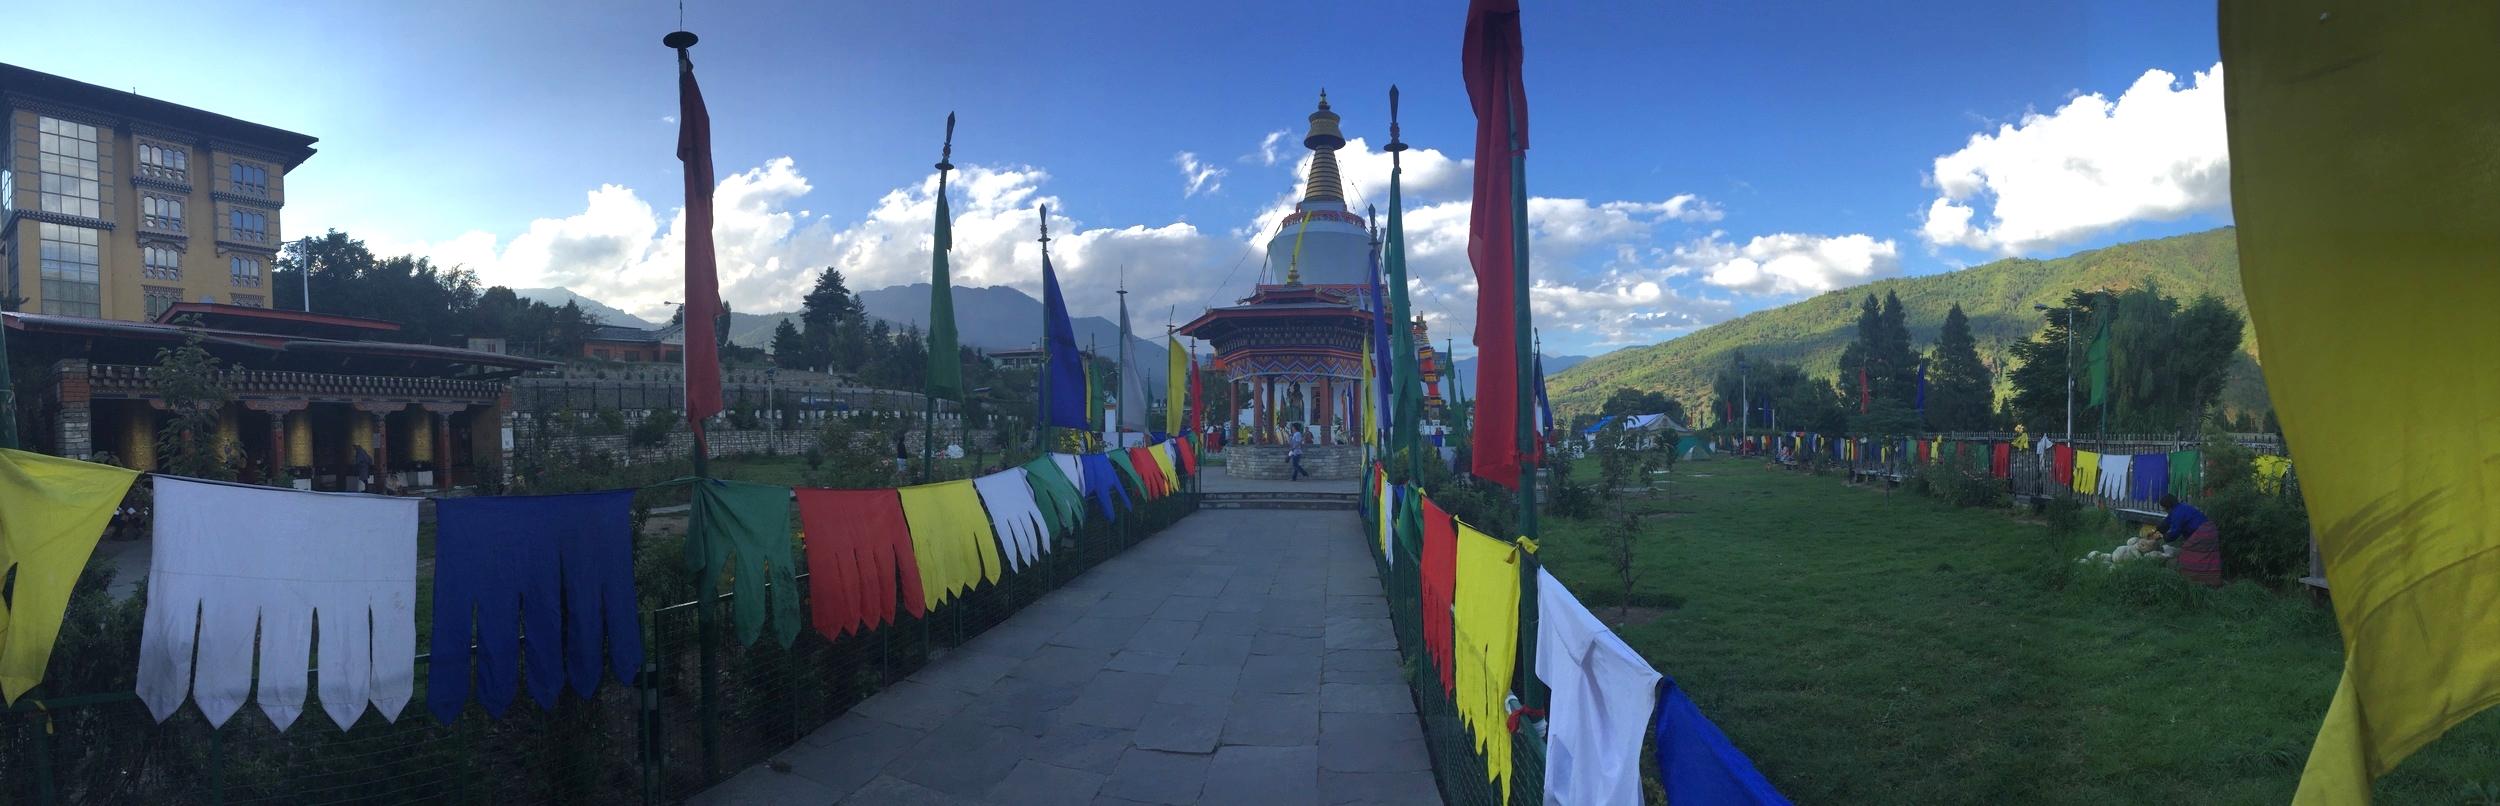 This popular stupa is a memorial to the third King Wangchuk, who democratized Bhutan